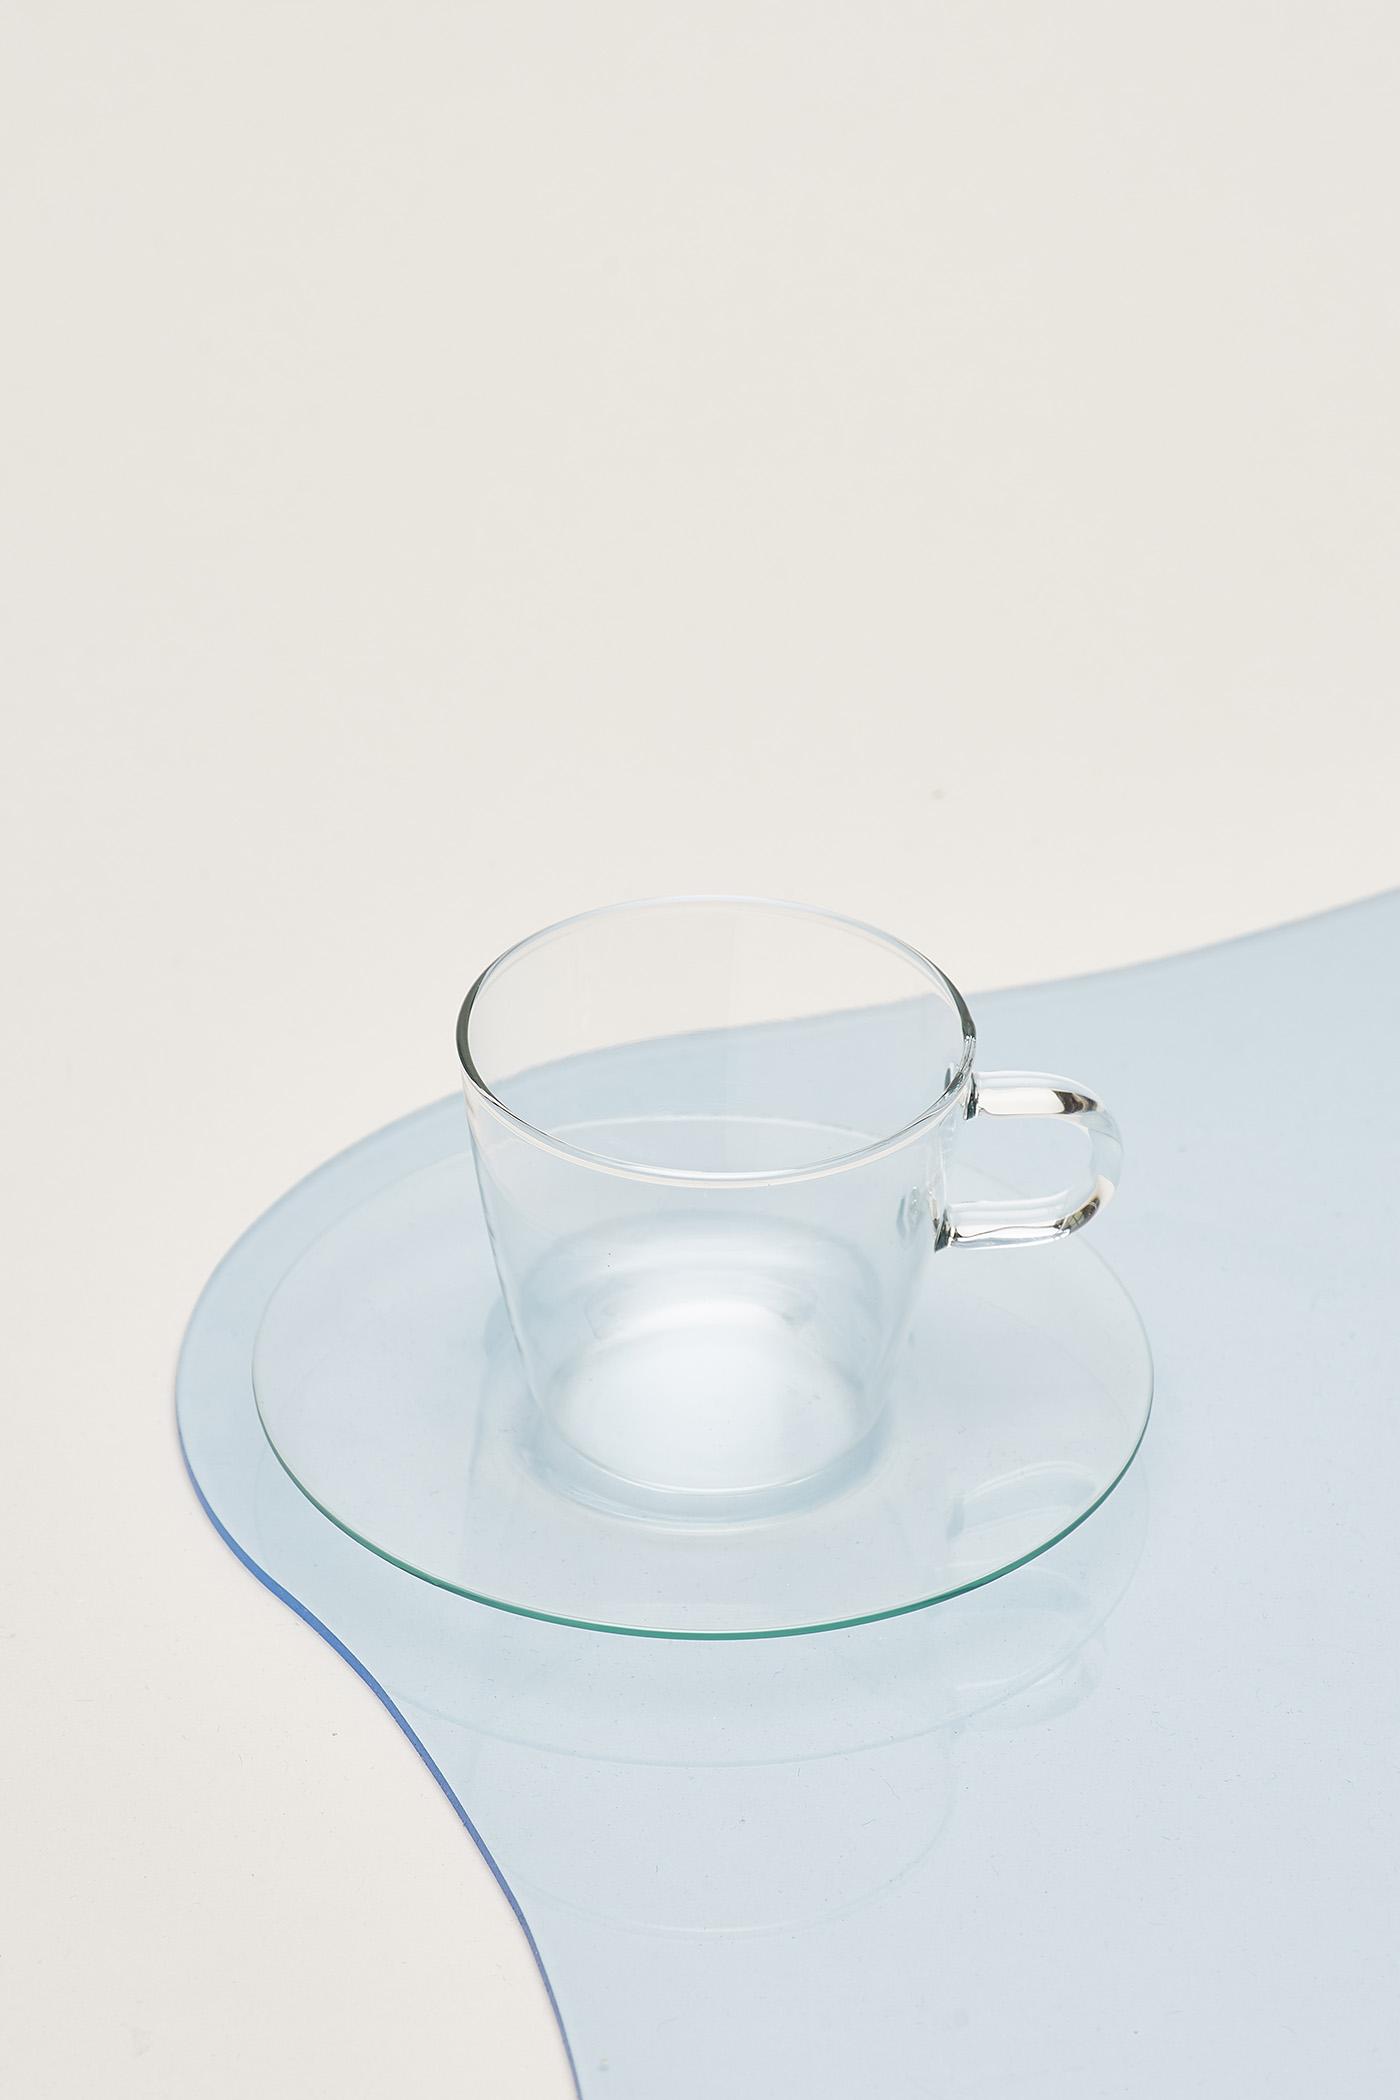 Trendglas Costa I Coffeeglass with Saucer